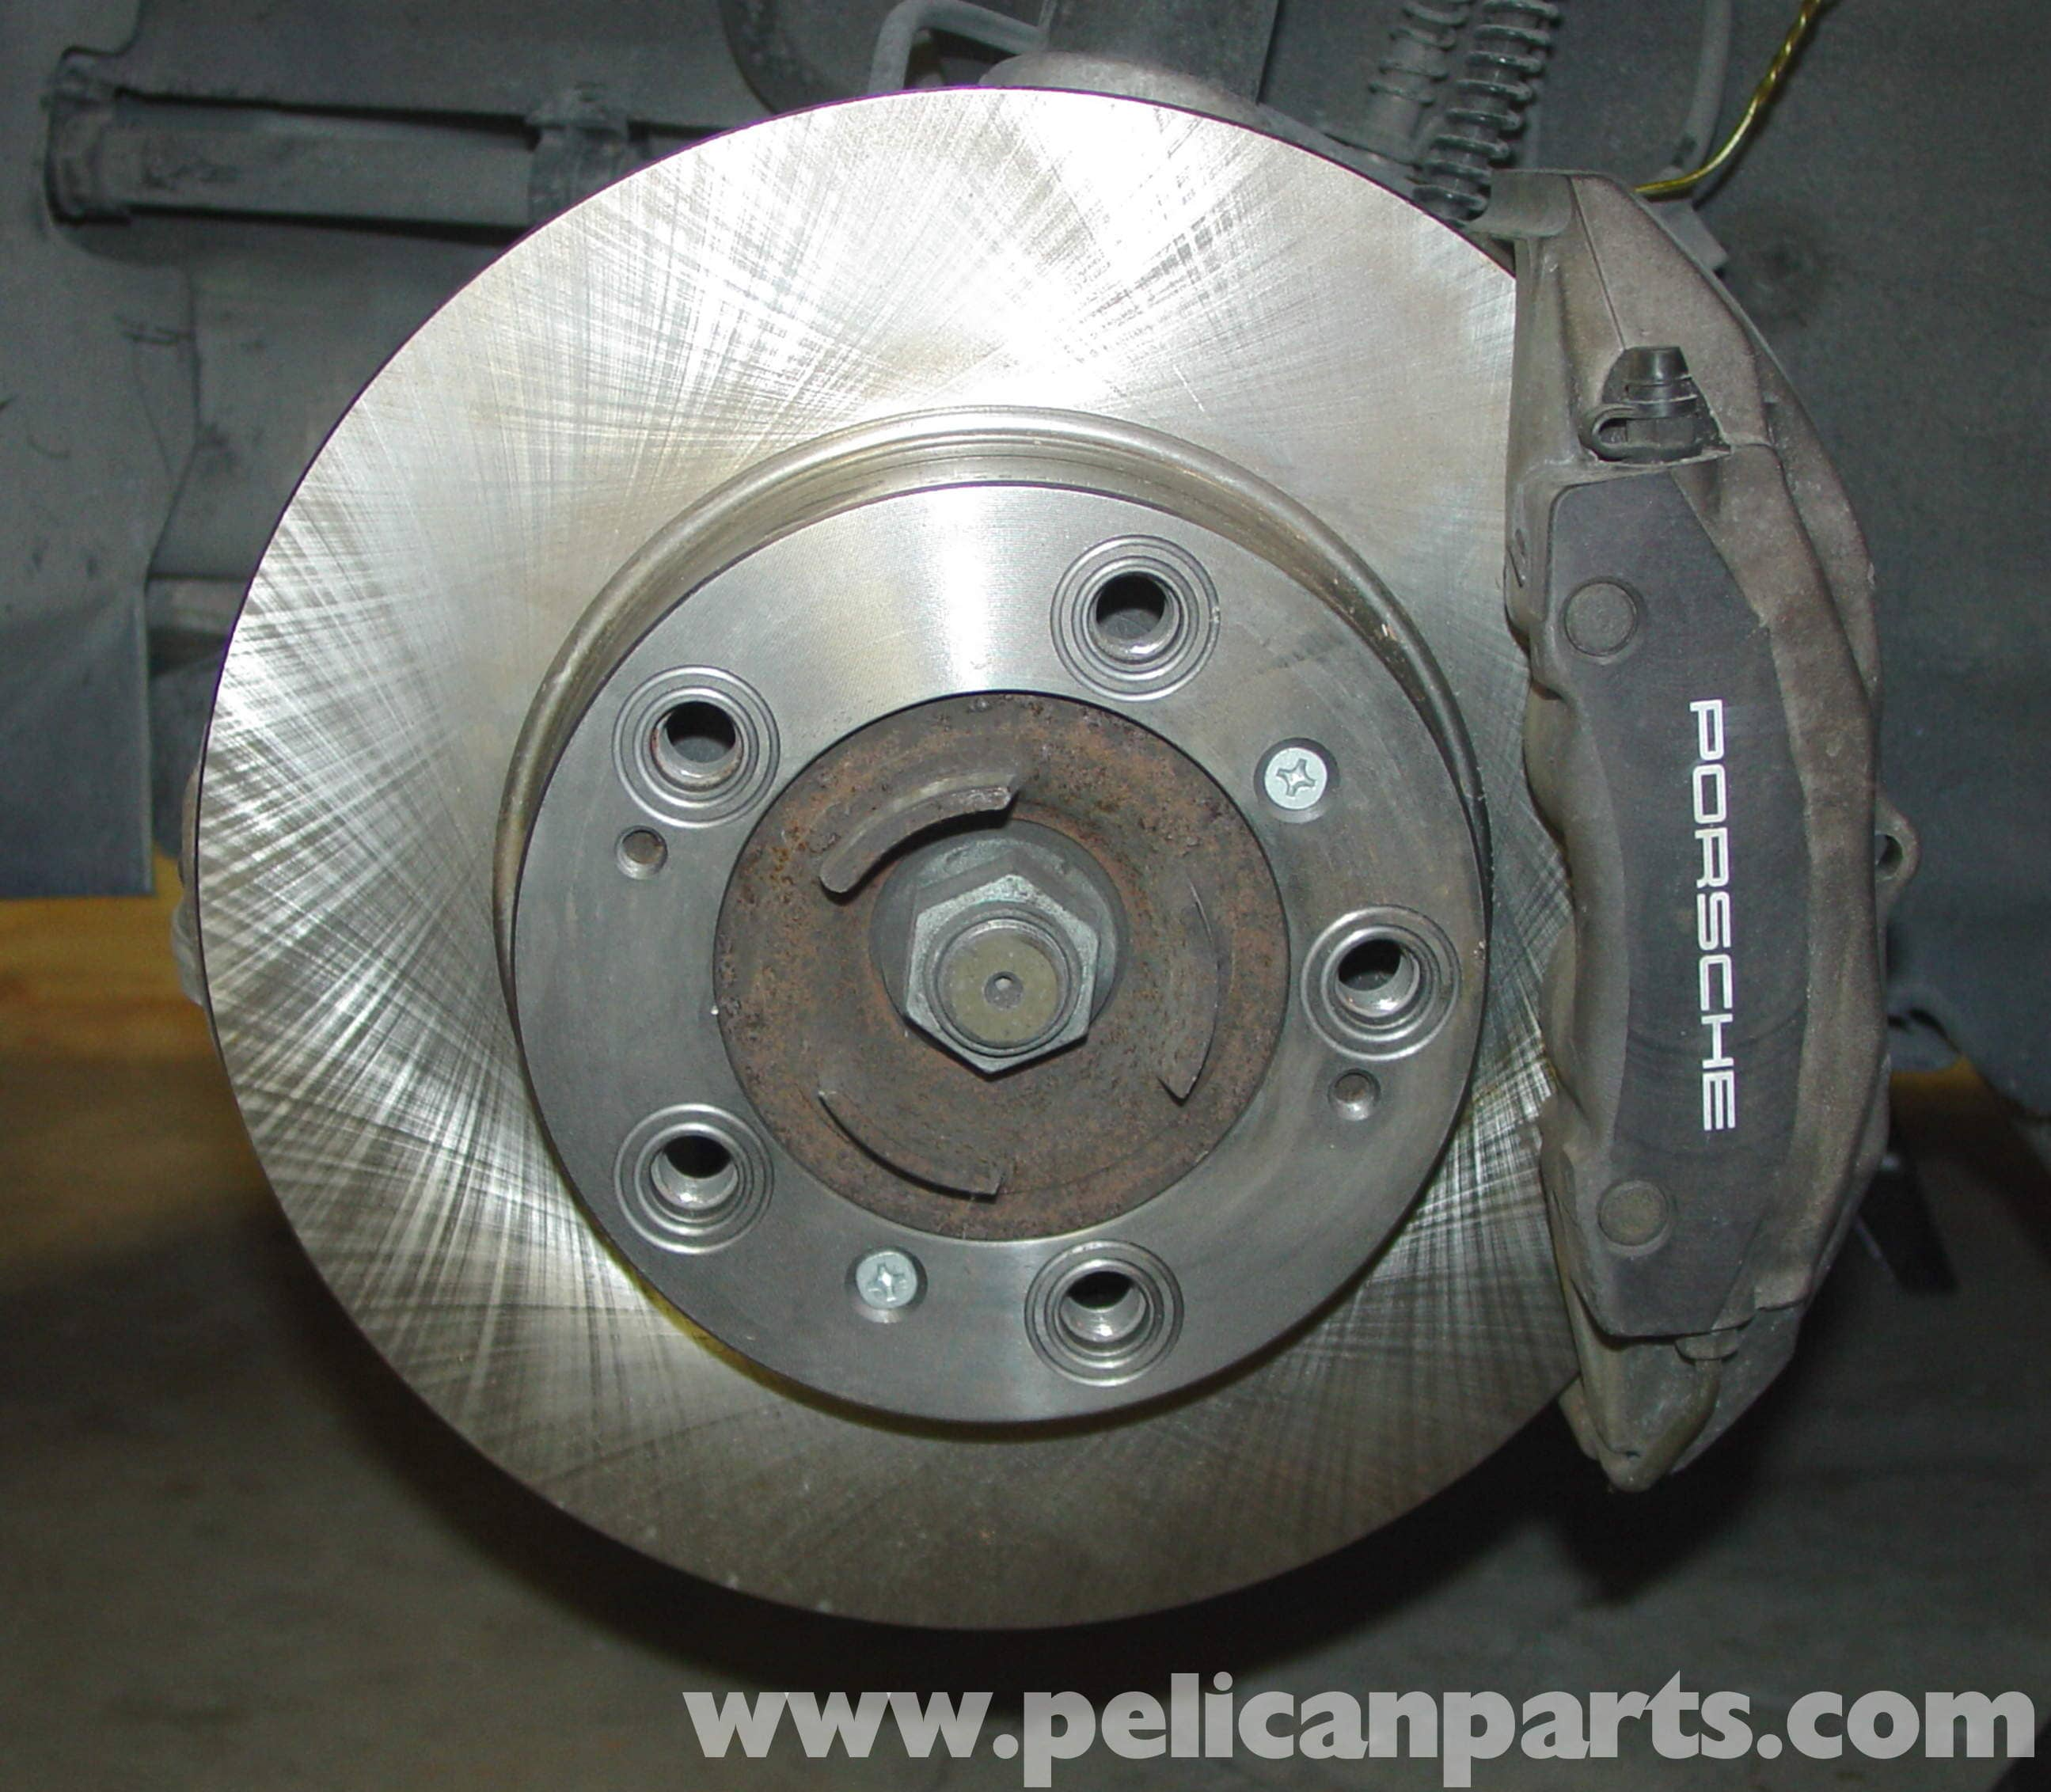 For Porsche Boxster Front Brake Job 2-Pieces Rotors Ceramic Pads Wear Sensors